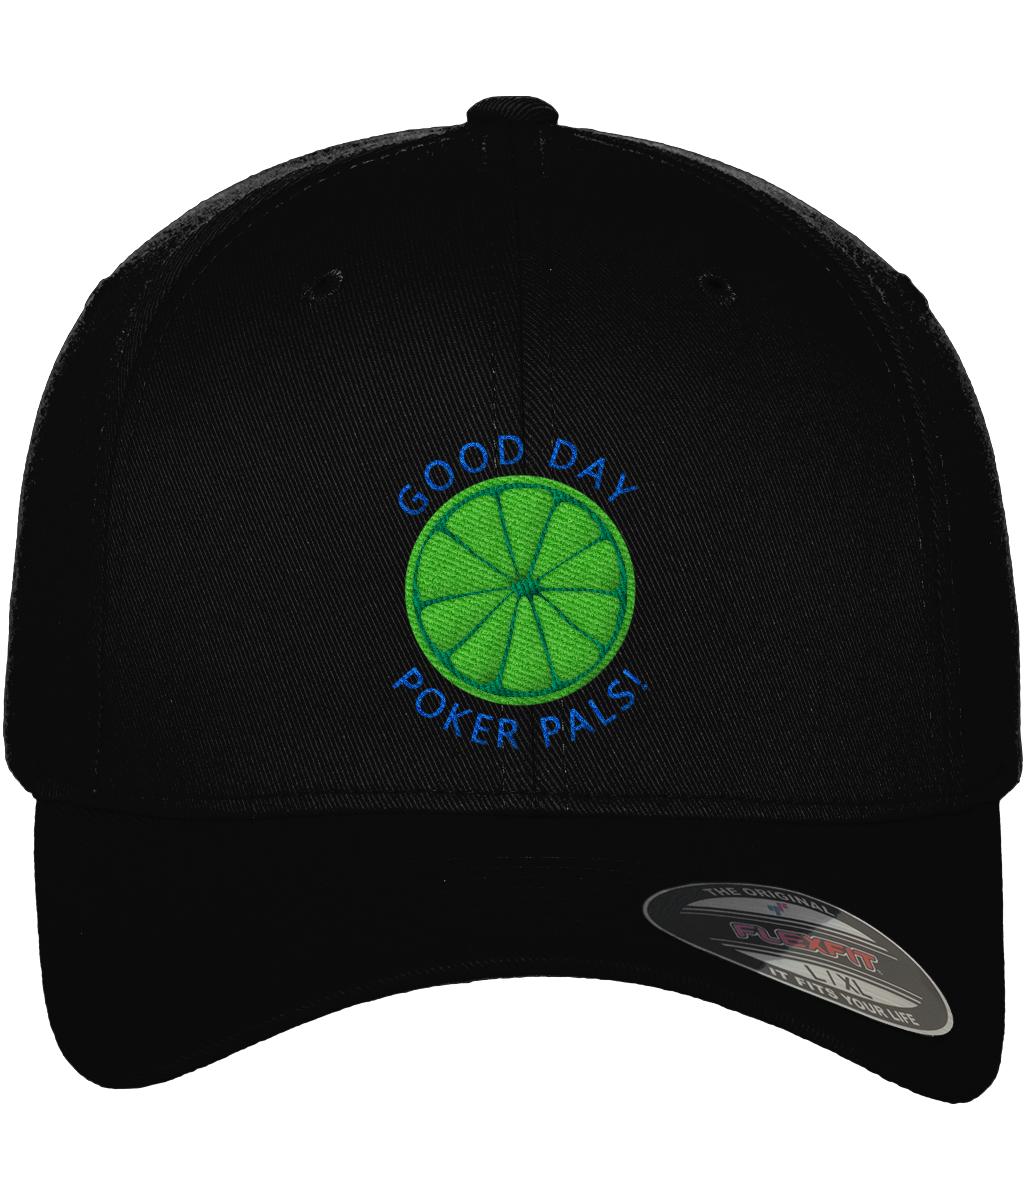 Limerickey Baseball Cap - Black